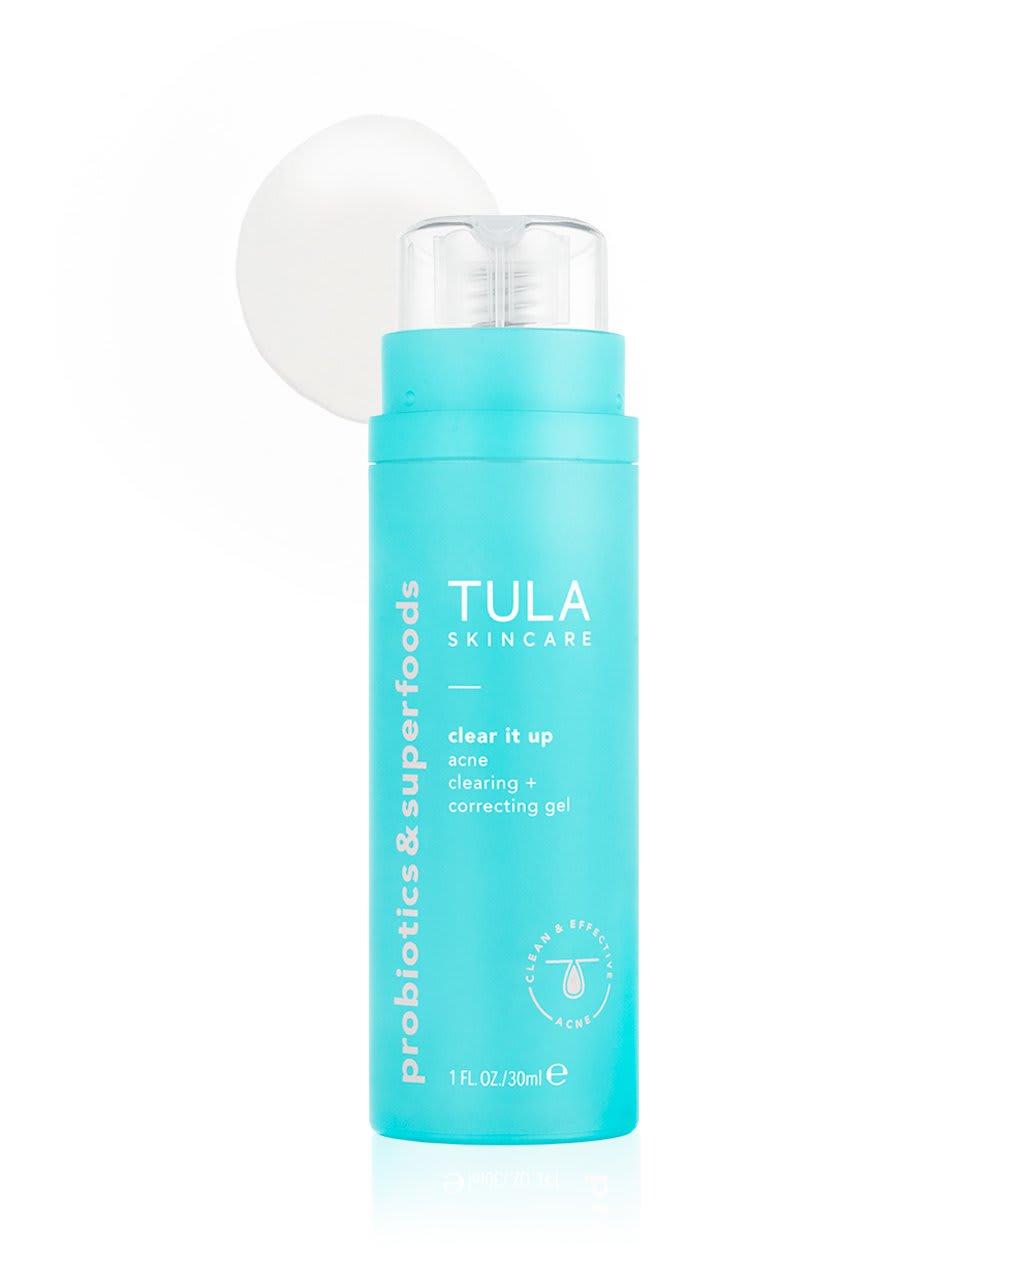 acne clearing + tone correcting gel | Tula Skincare